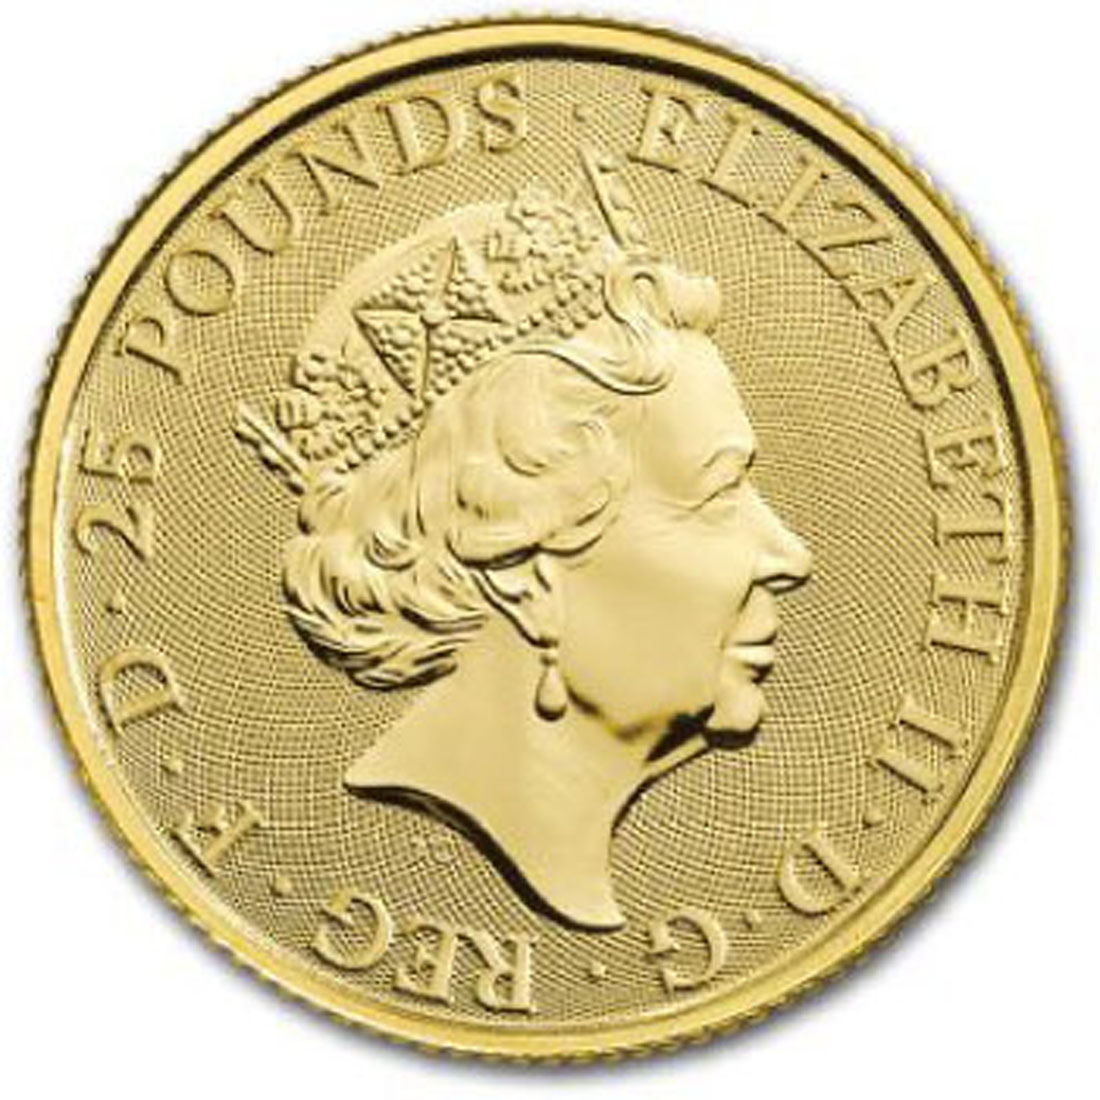 Lieferumfang:Großbritannien : 25 Pfund The Queen´s Beasts - Yale  2019 Stgl.